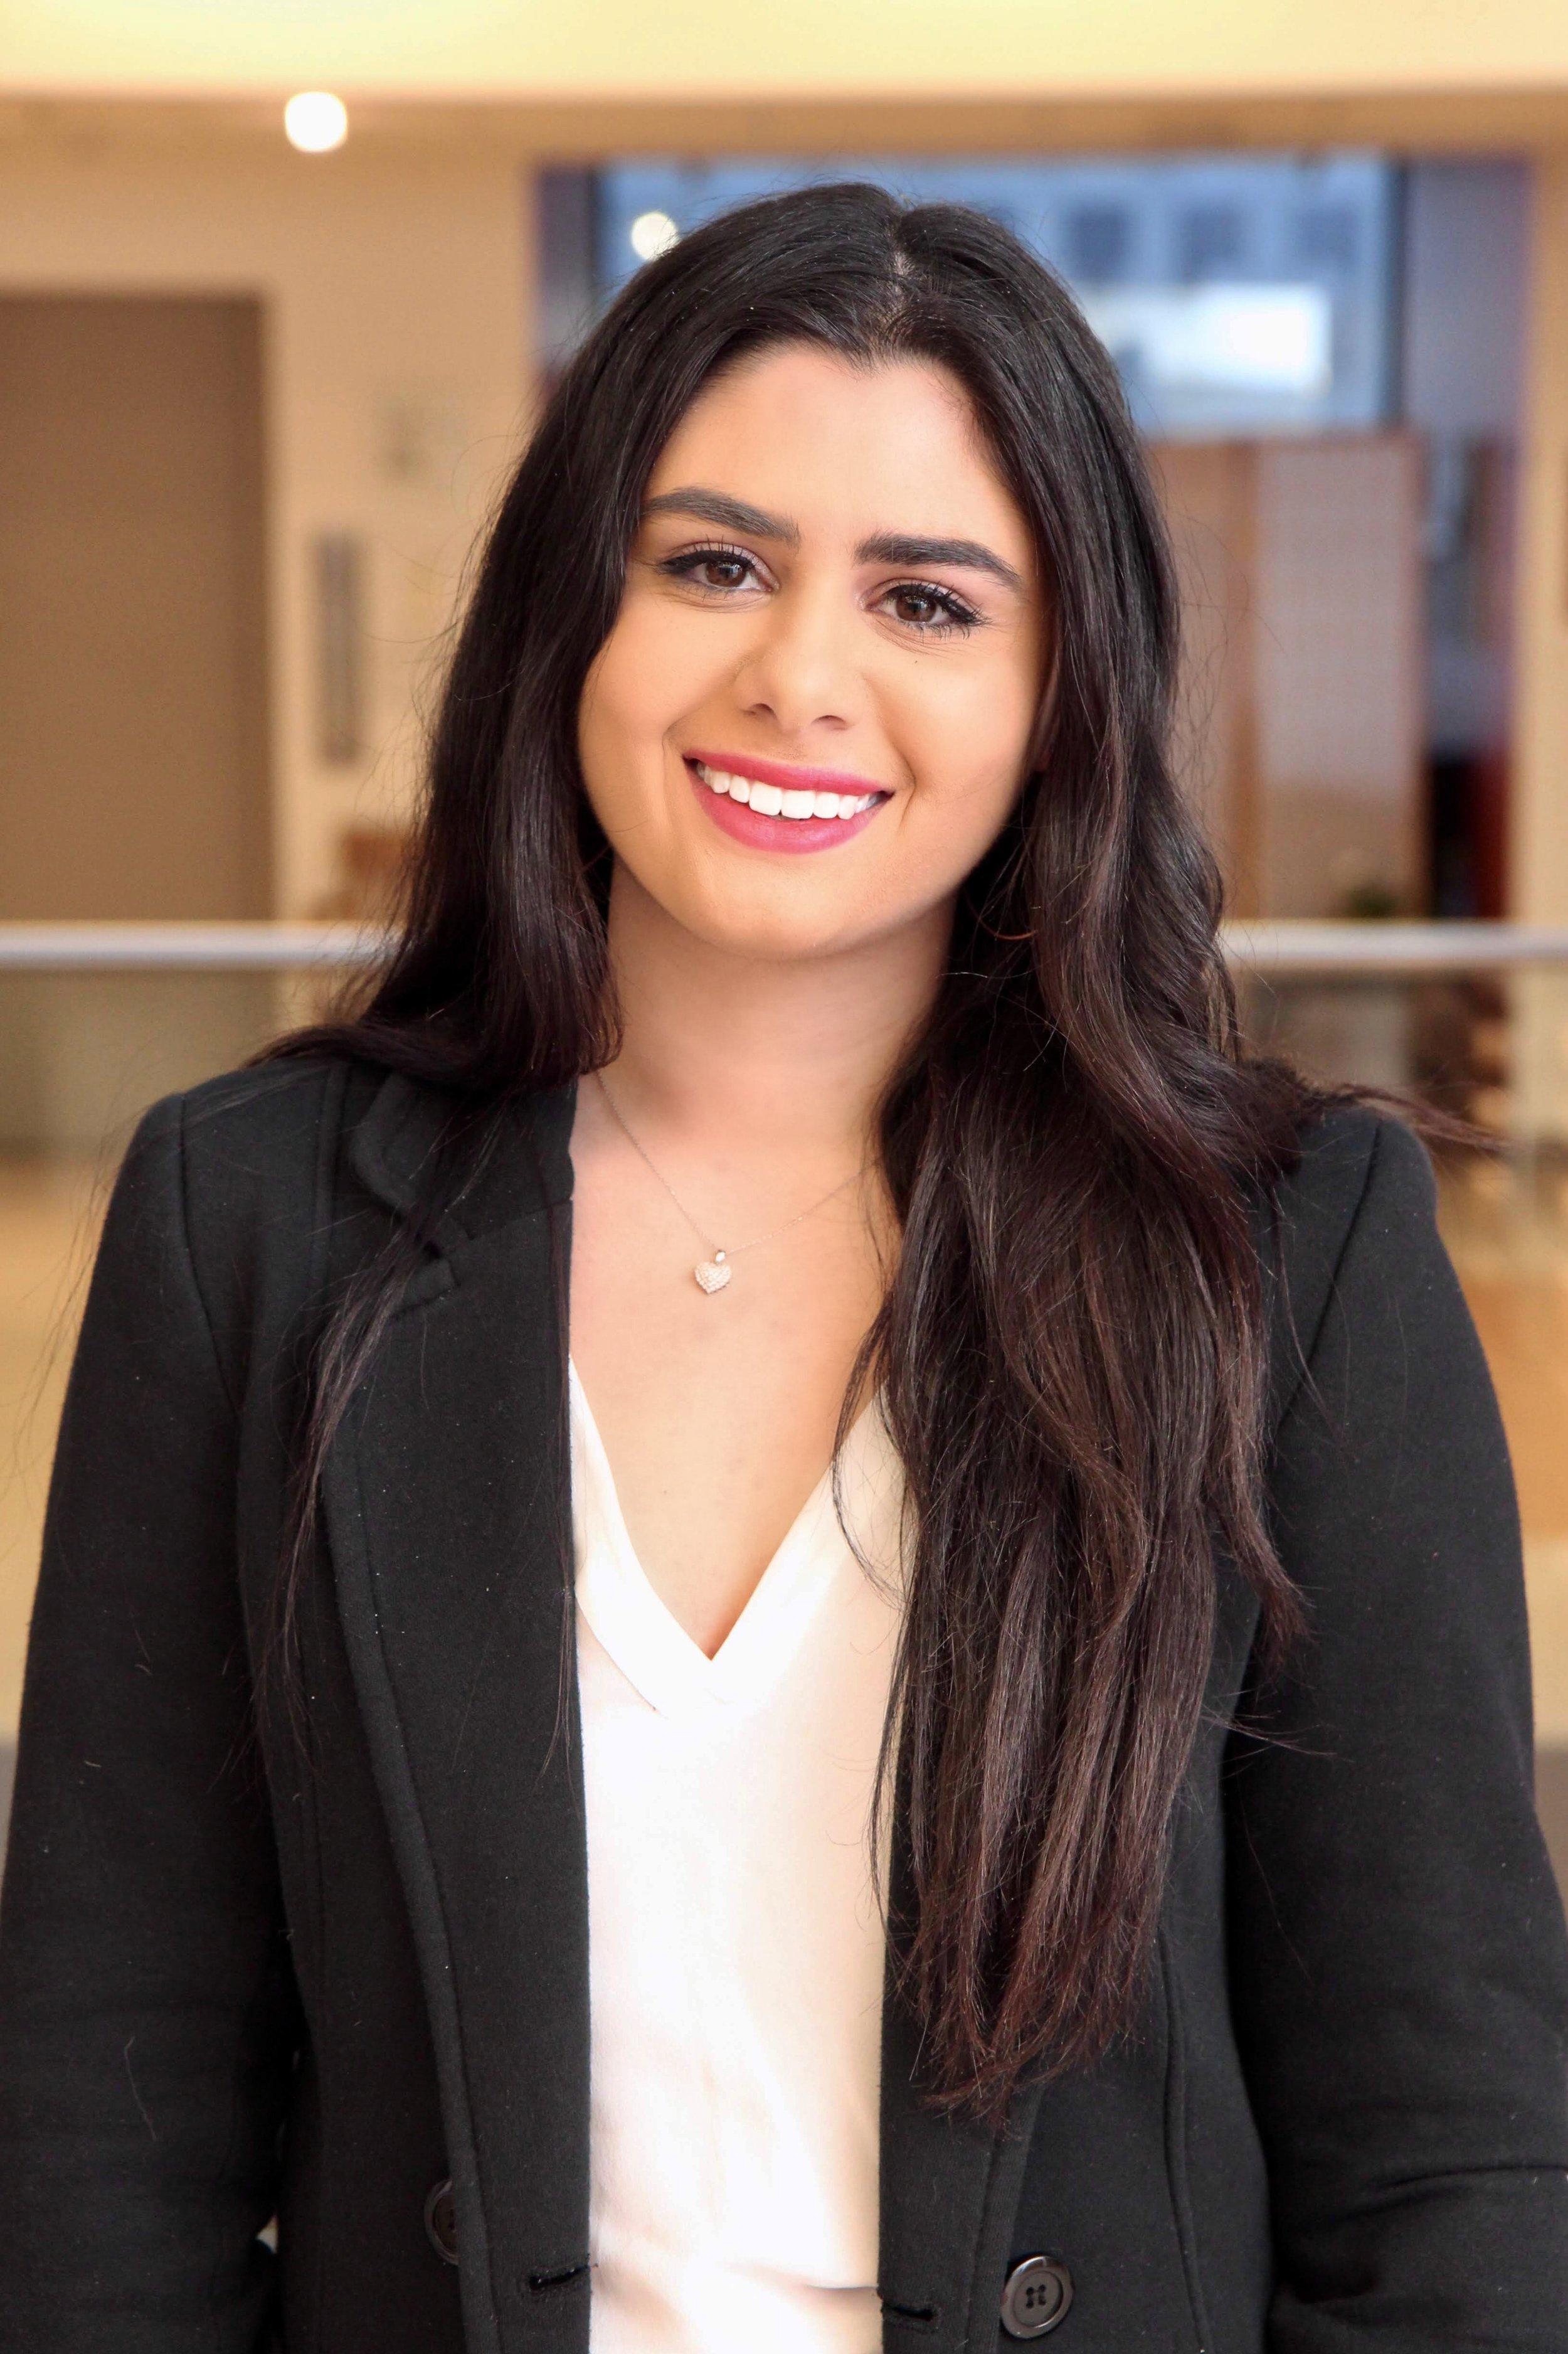 Catalina Karam  (catalina.karam@mail.mcgill.ca)